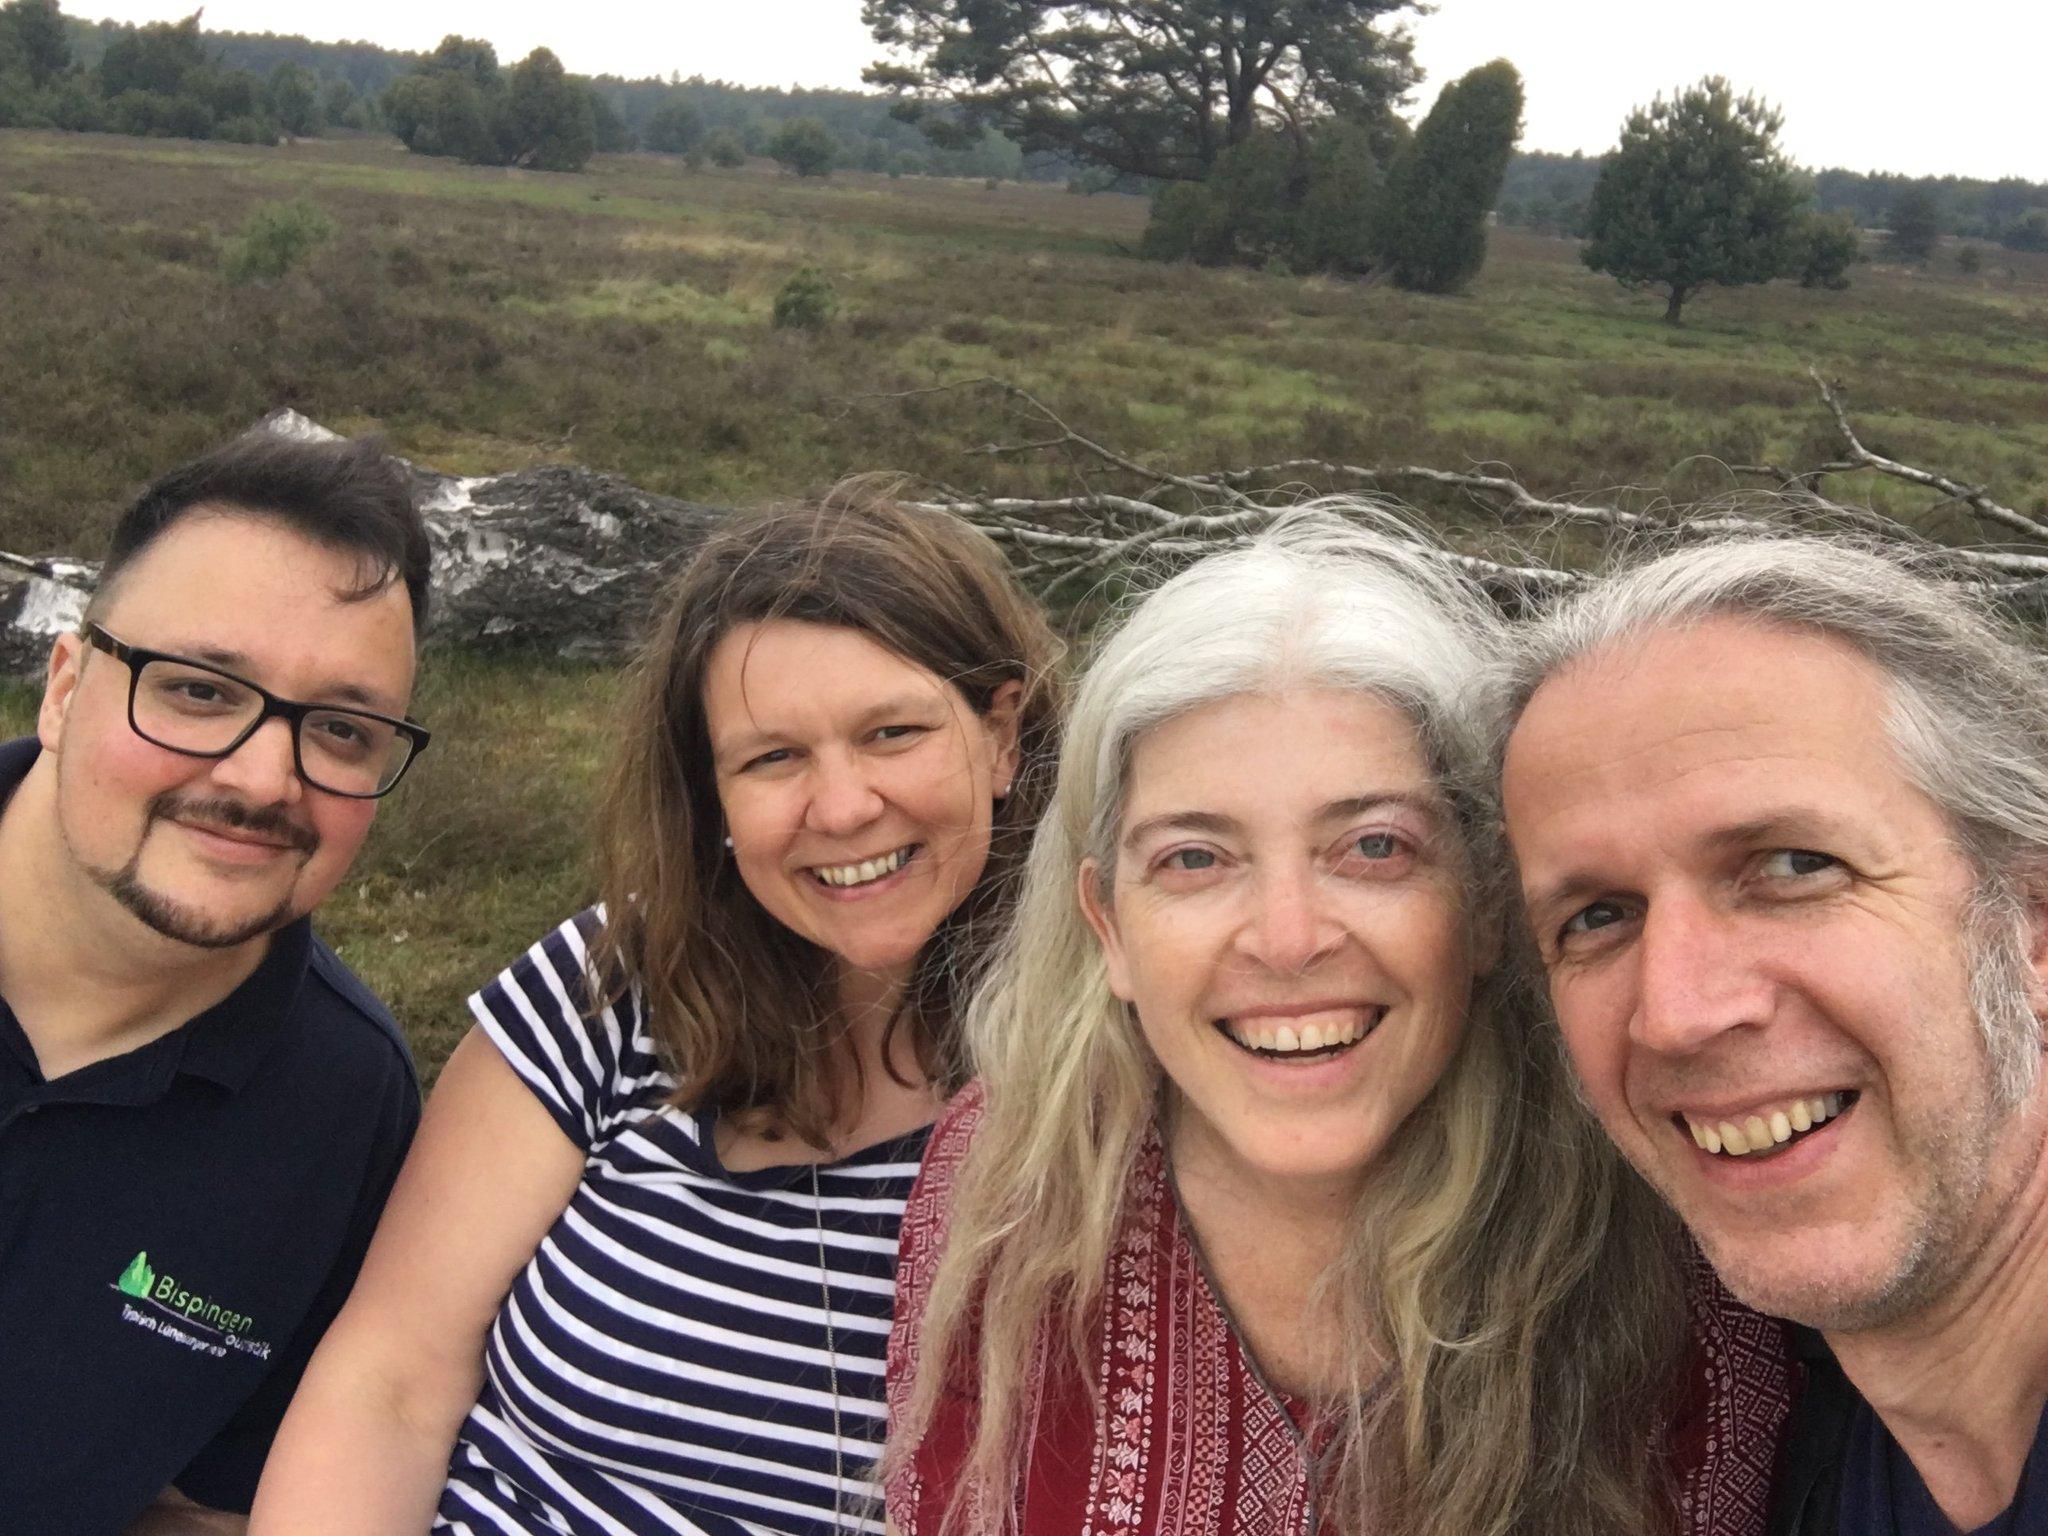 Heide-Selfie #meurers #meinbispingen #heidebloggerevent mit @HDRmeurer @SPANESS und @BispingenTouri https://t.co/GjSIxmhA2D